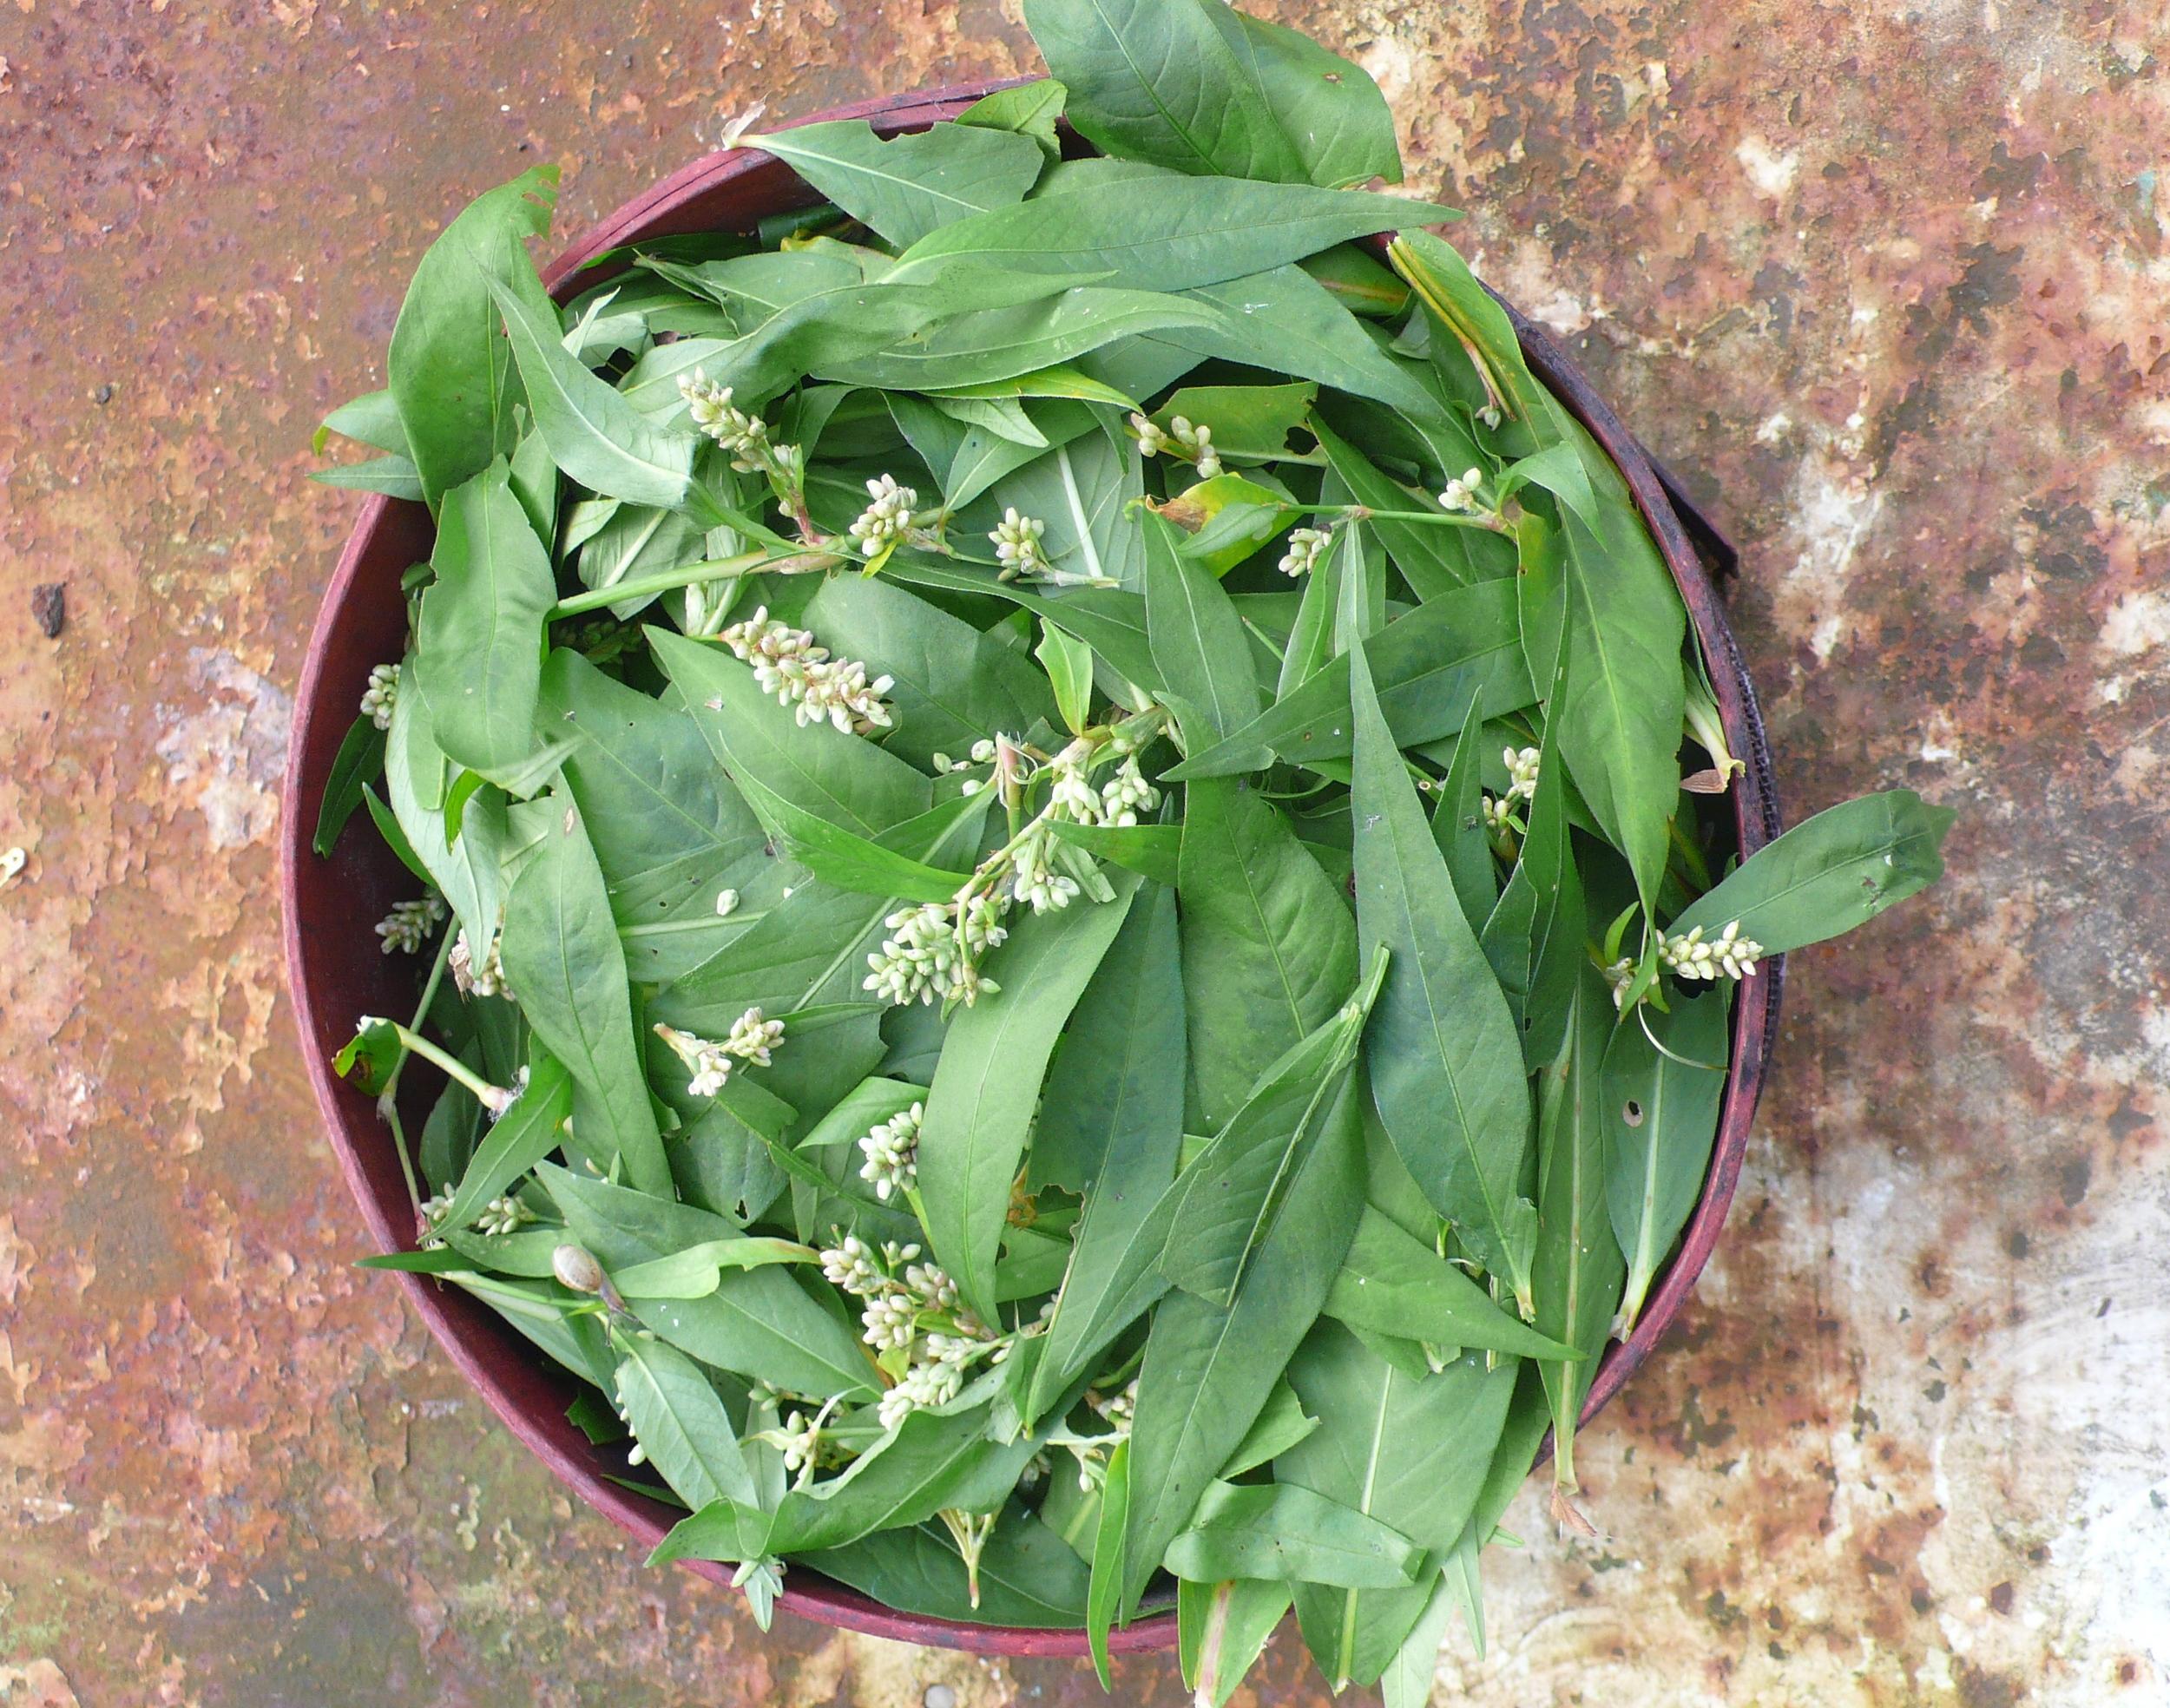 Fresh polygonum leaves